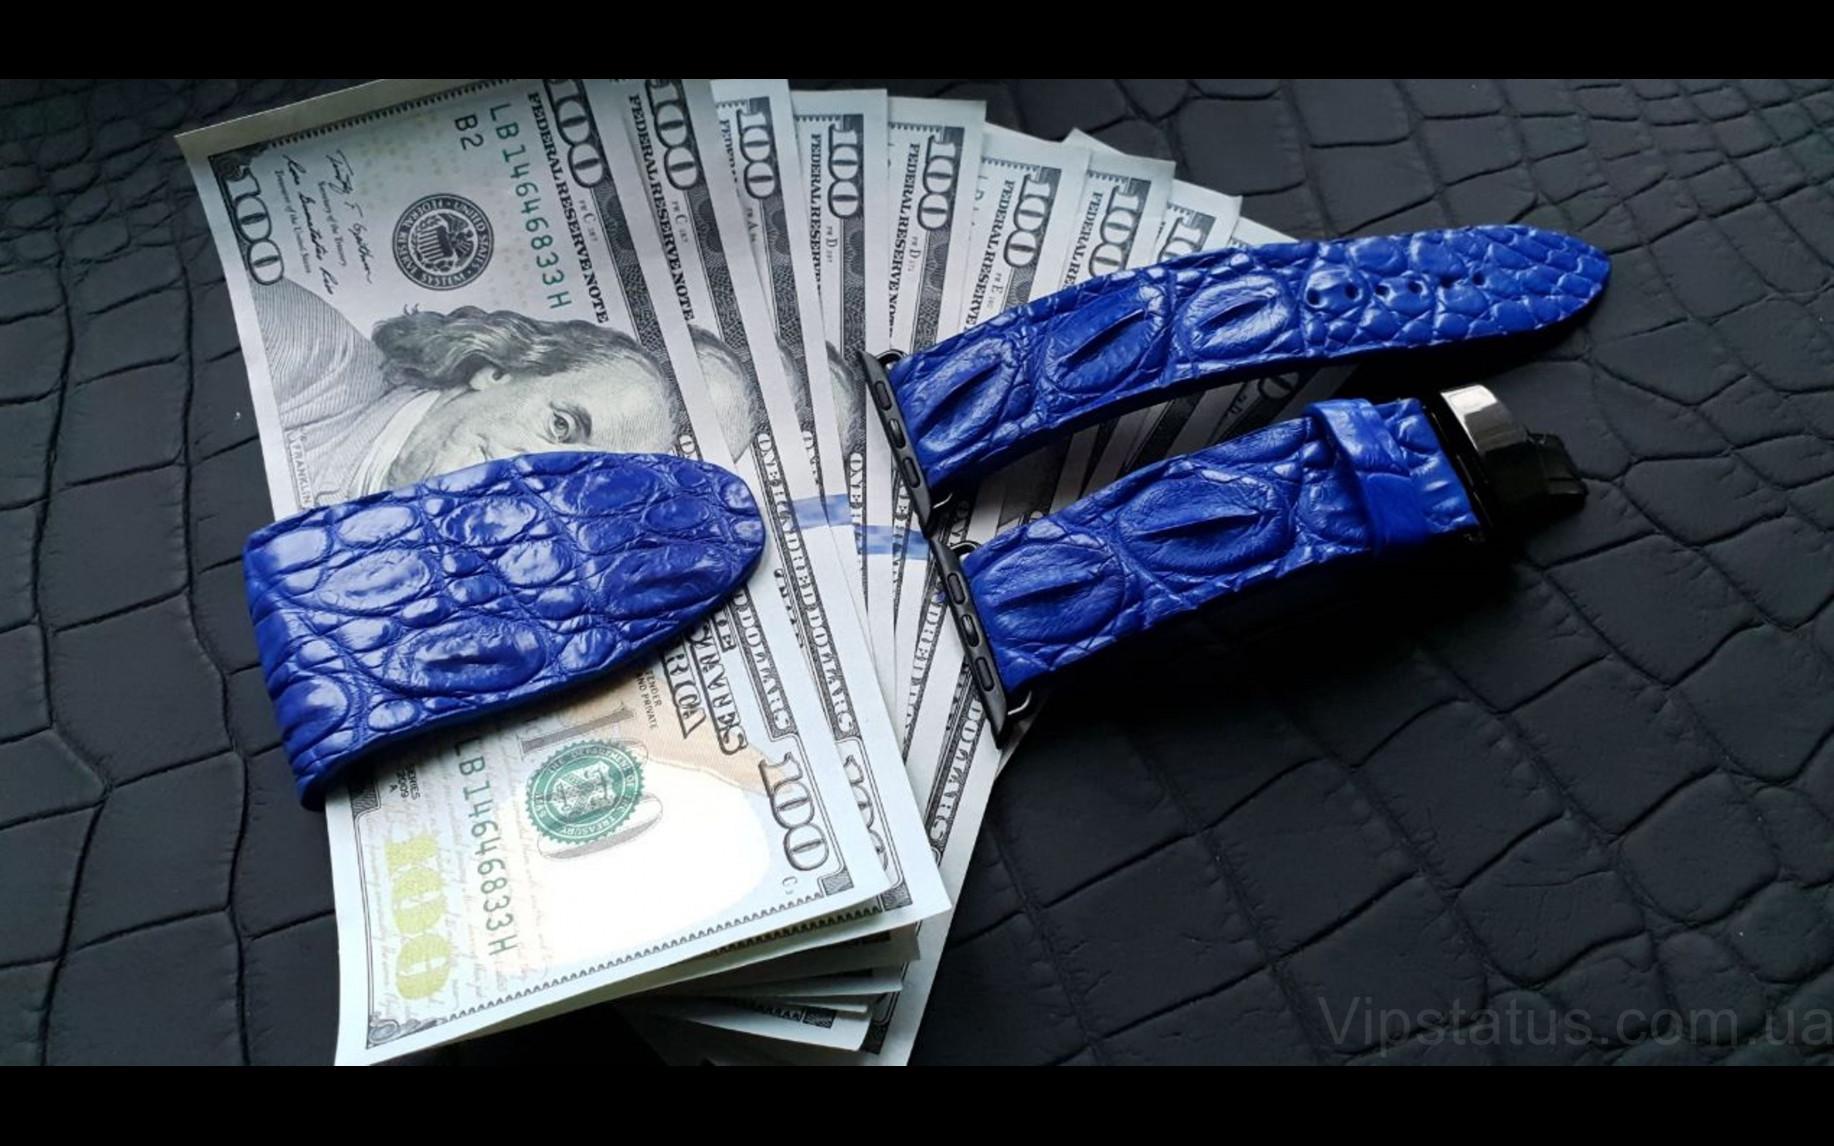 Elite Blue King Вип зажим для купюр Blue King Vip bill clip image 3